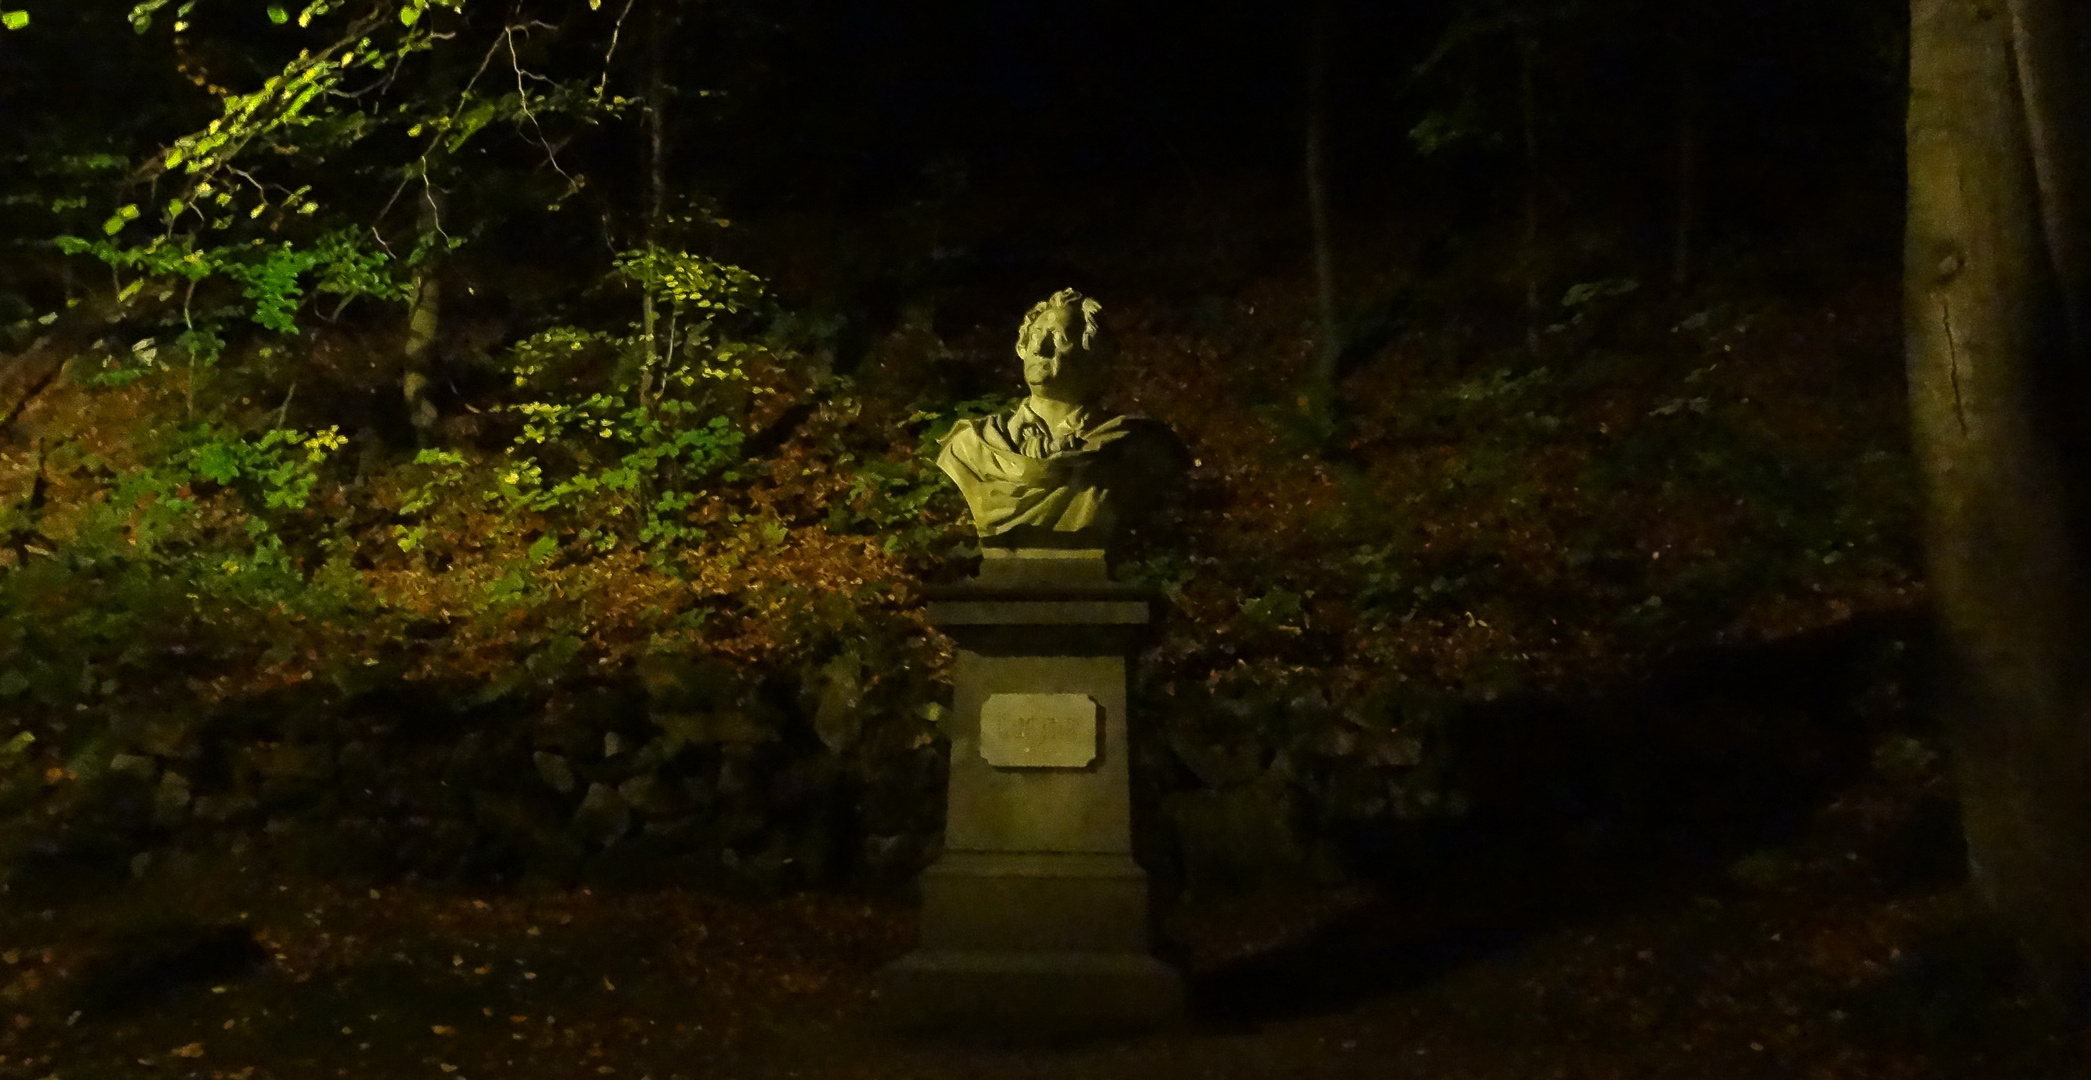 Goethe, Gedicht, vergangen...